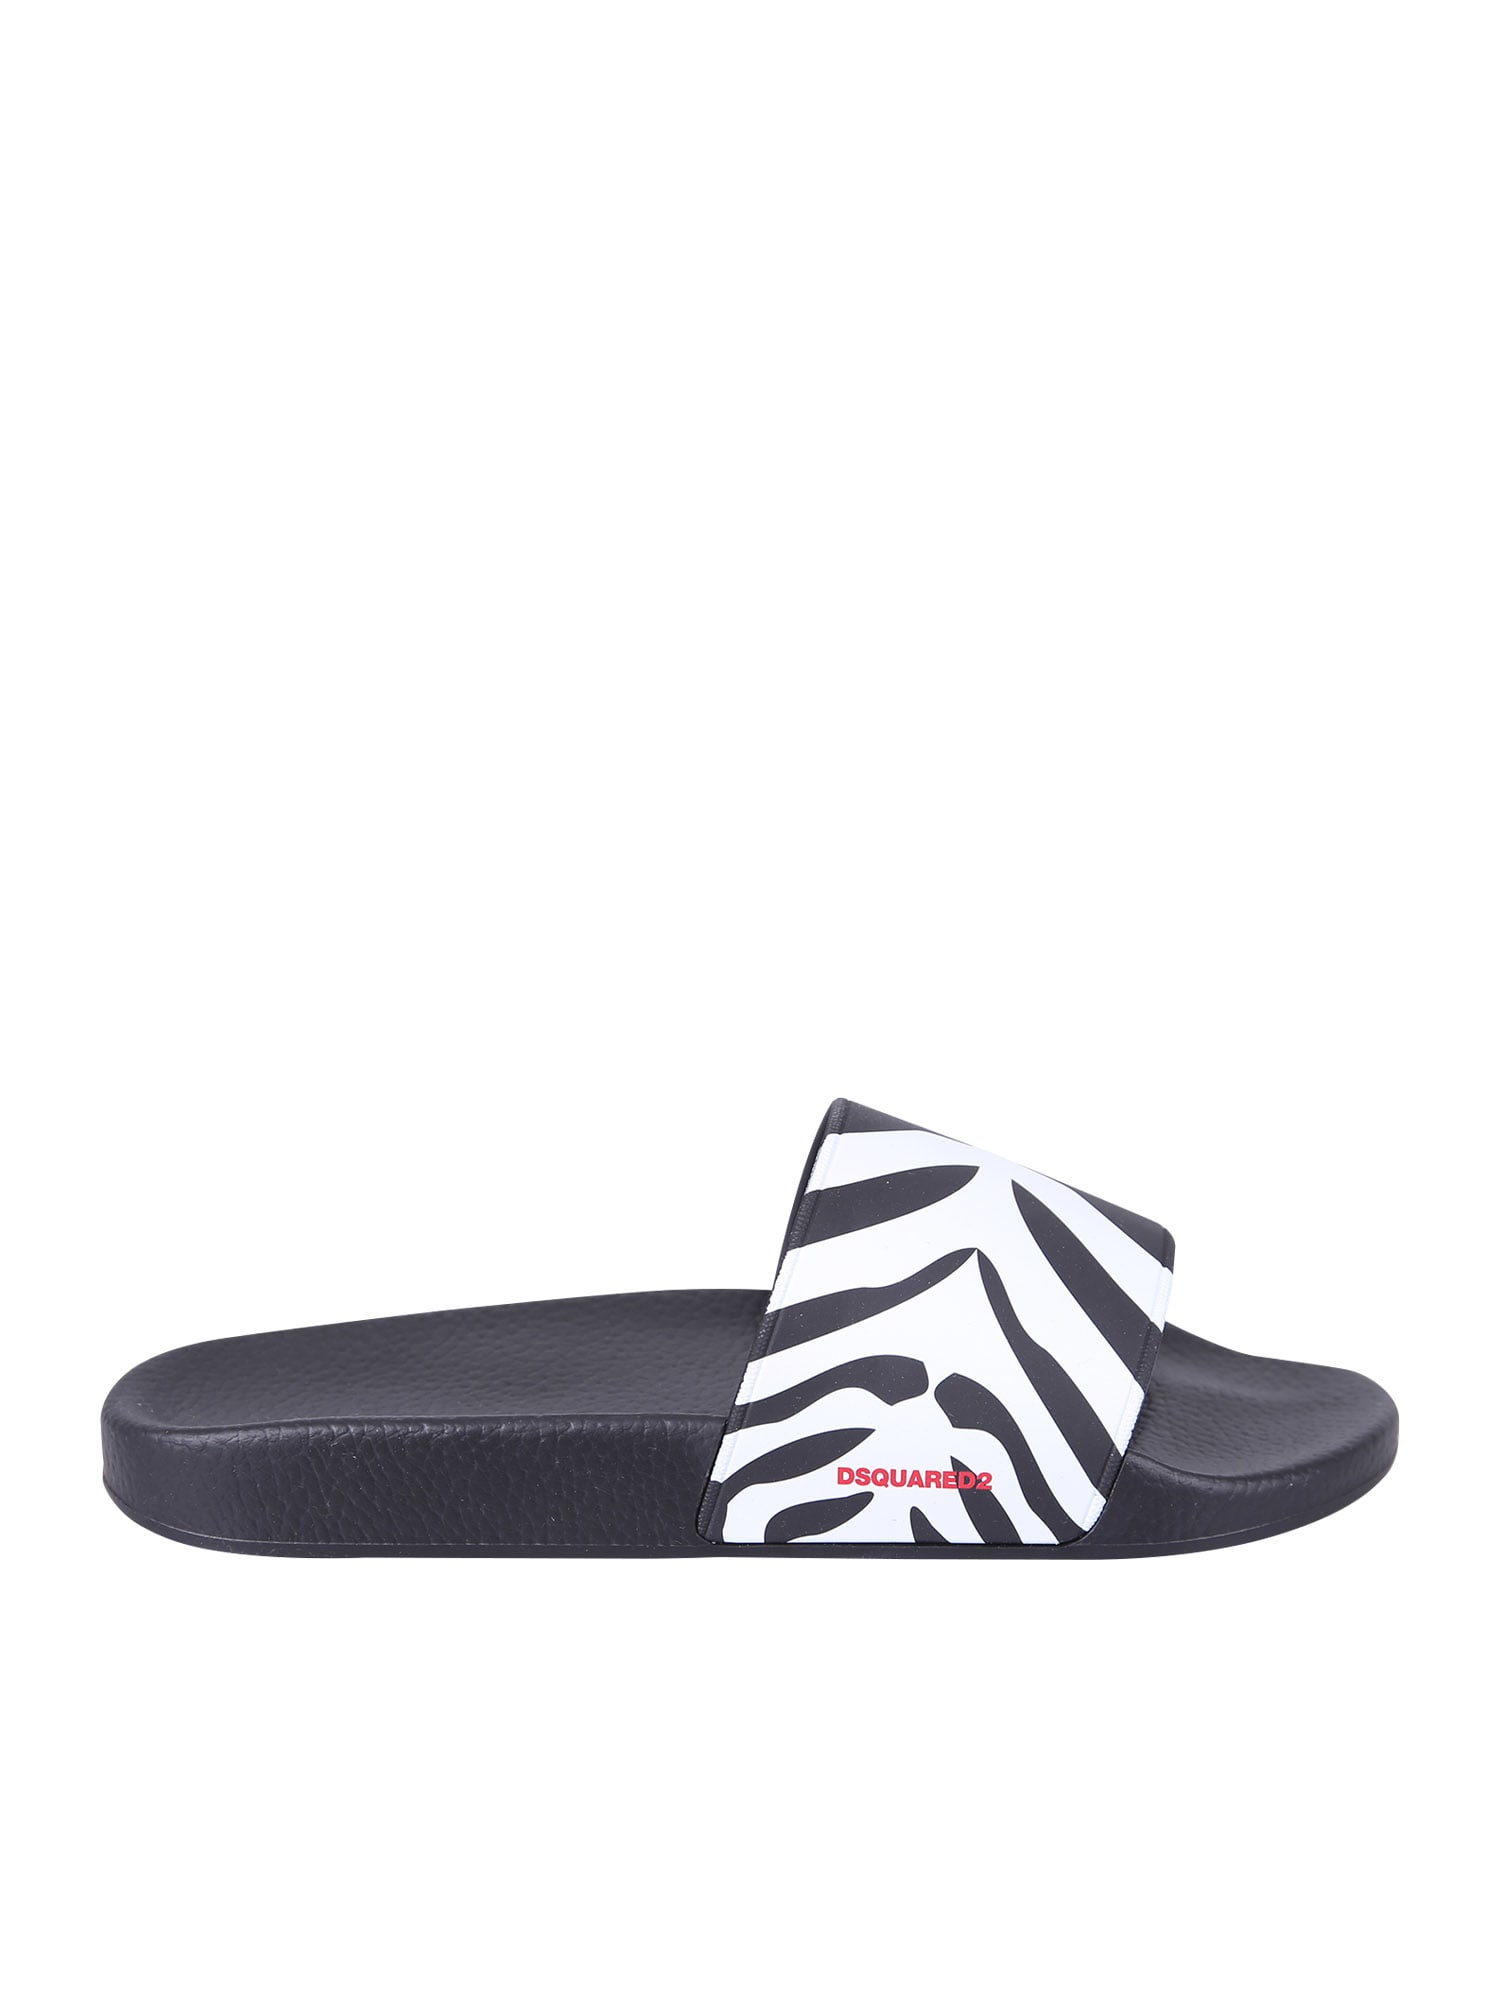 Dsquared2 Animalier Print Sandals